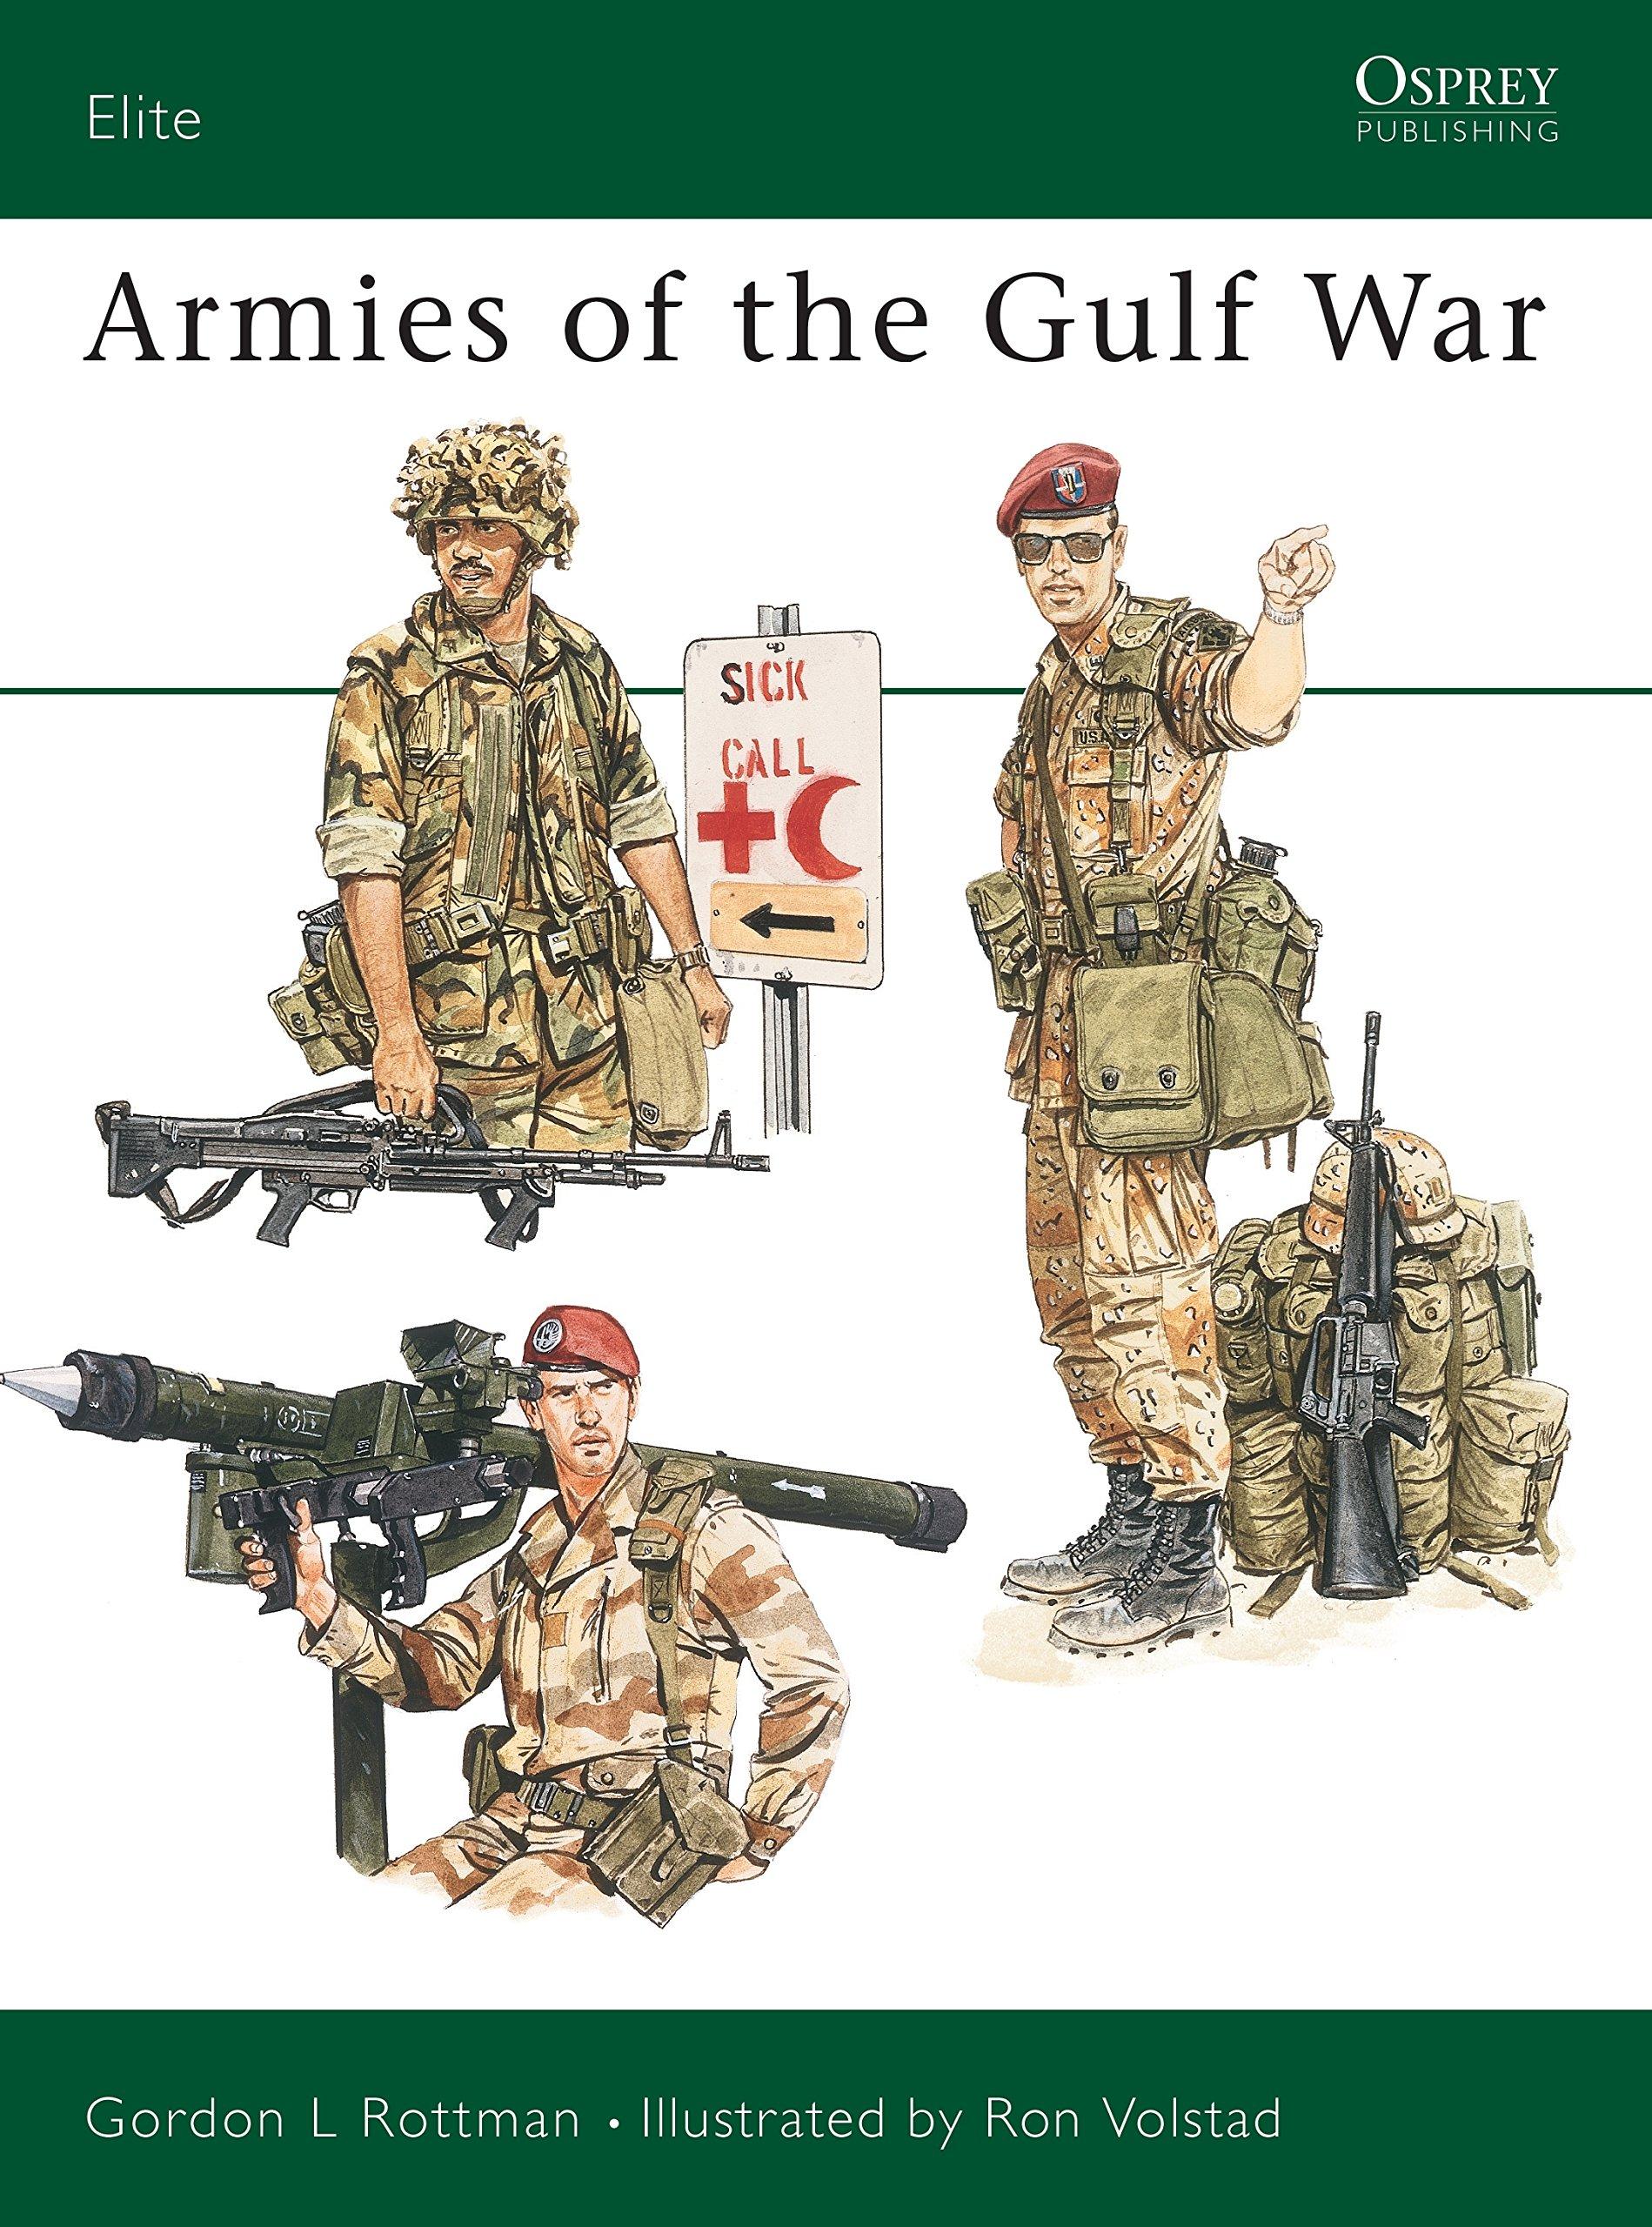 Armies of the Gulf War: No. 45 (Elite): Amazon.es: Rottman ...